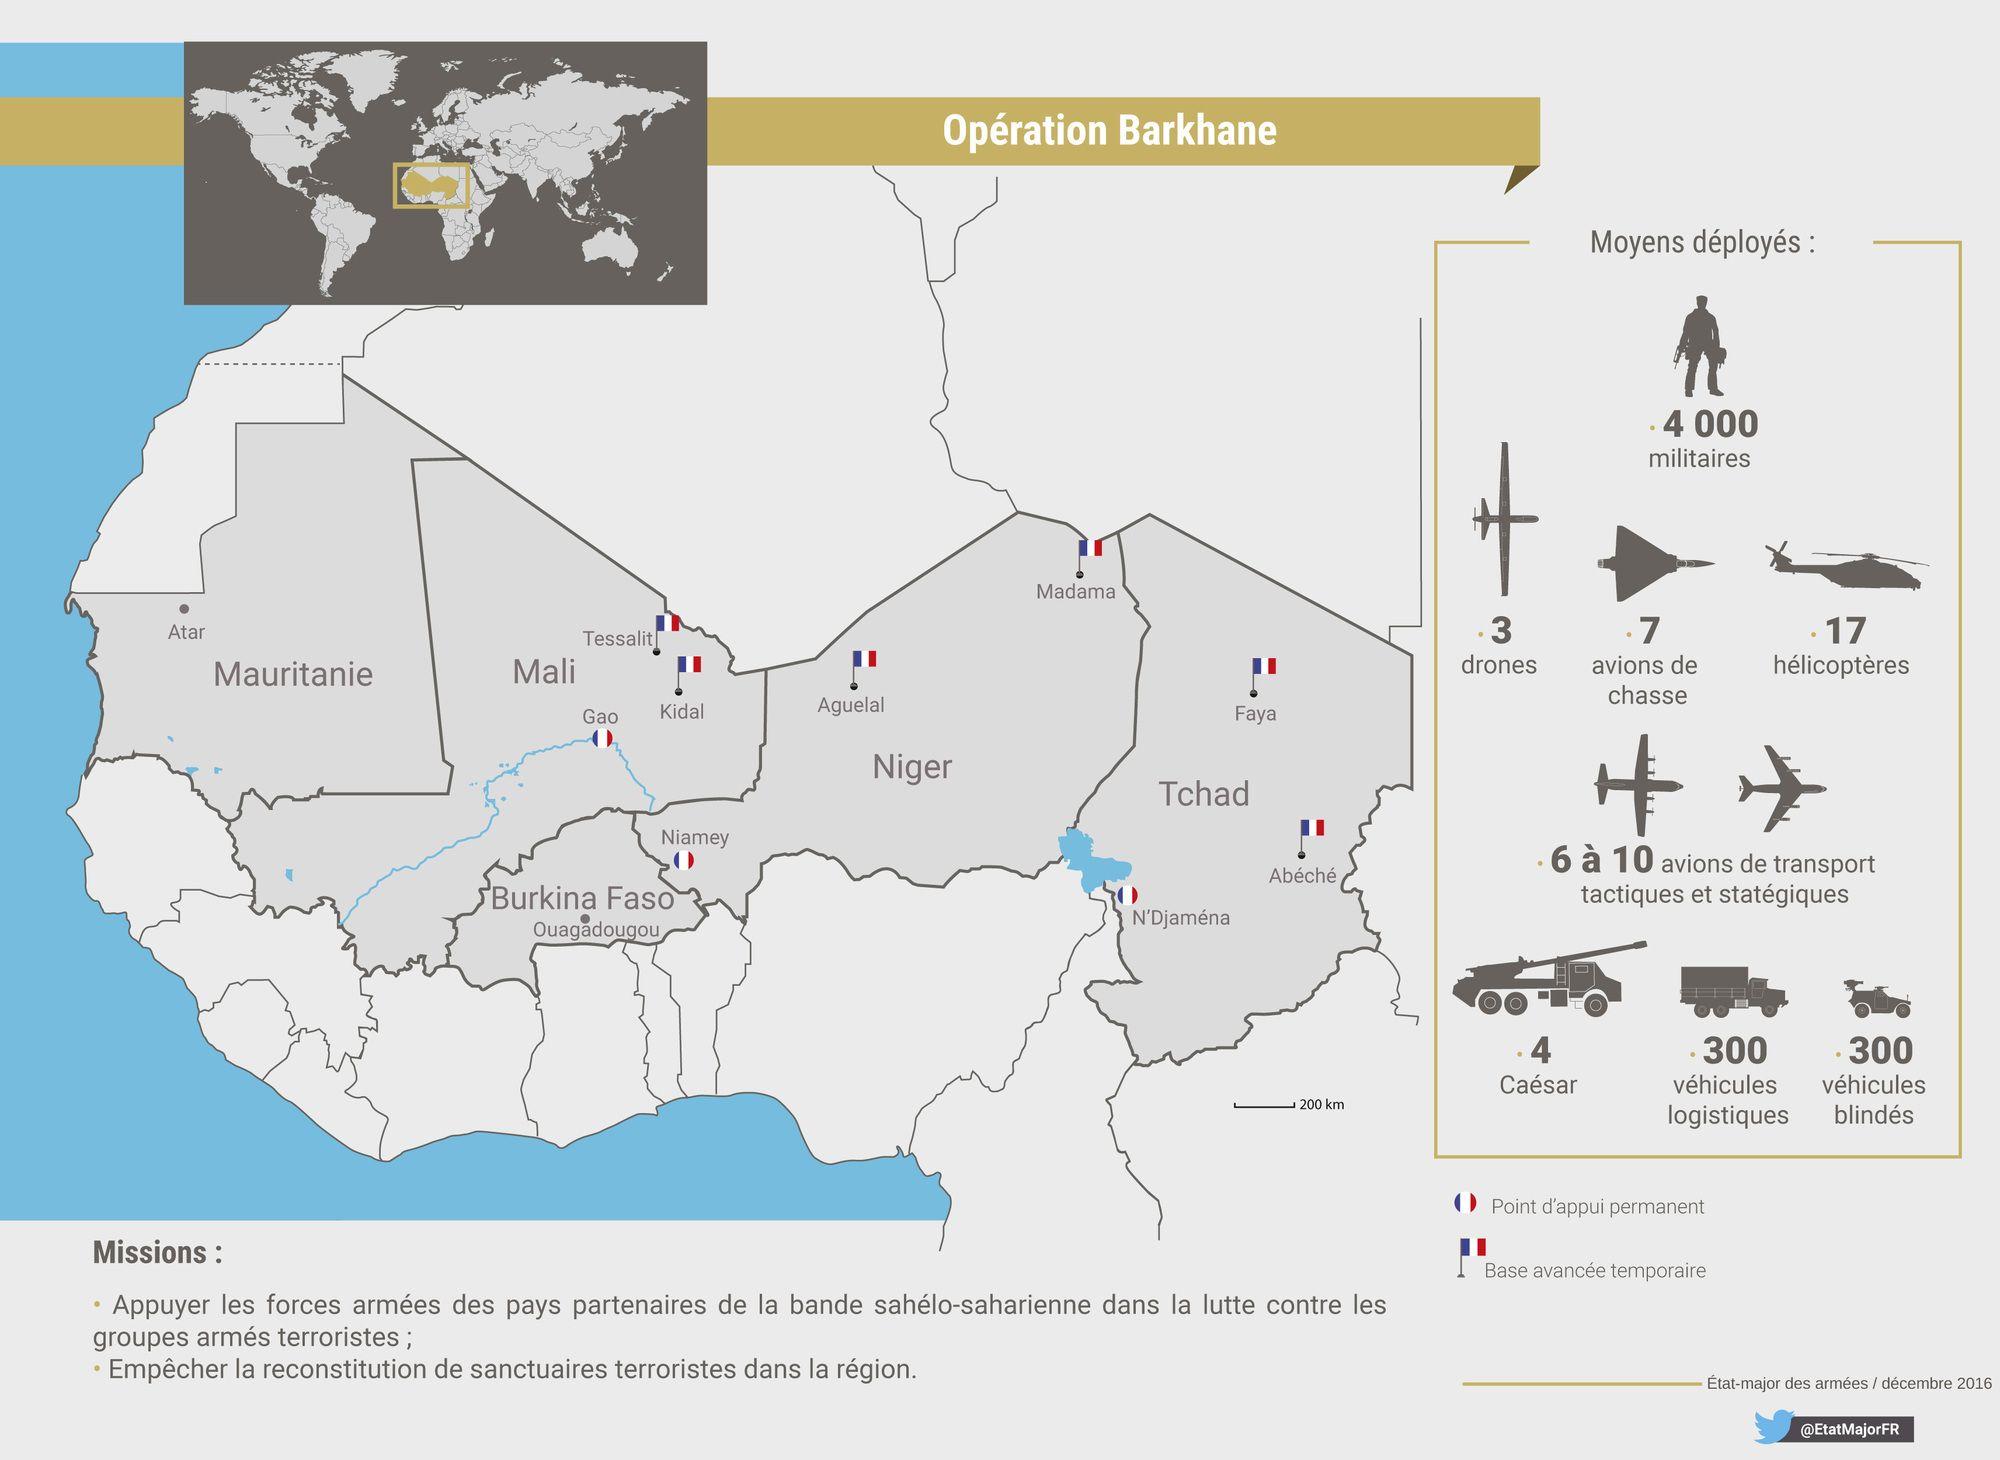 "Tshirt /"" OPERATION BARKHANE /"" armée française FRANCE opex T SHIRT"